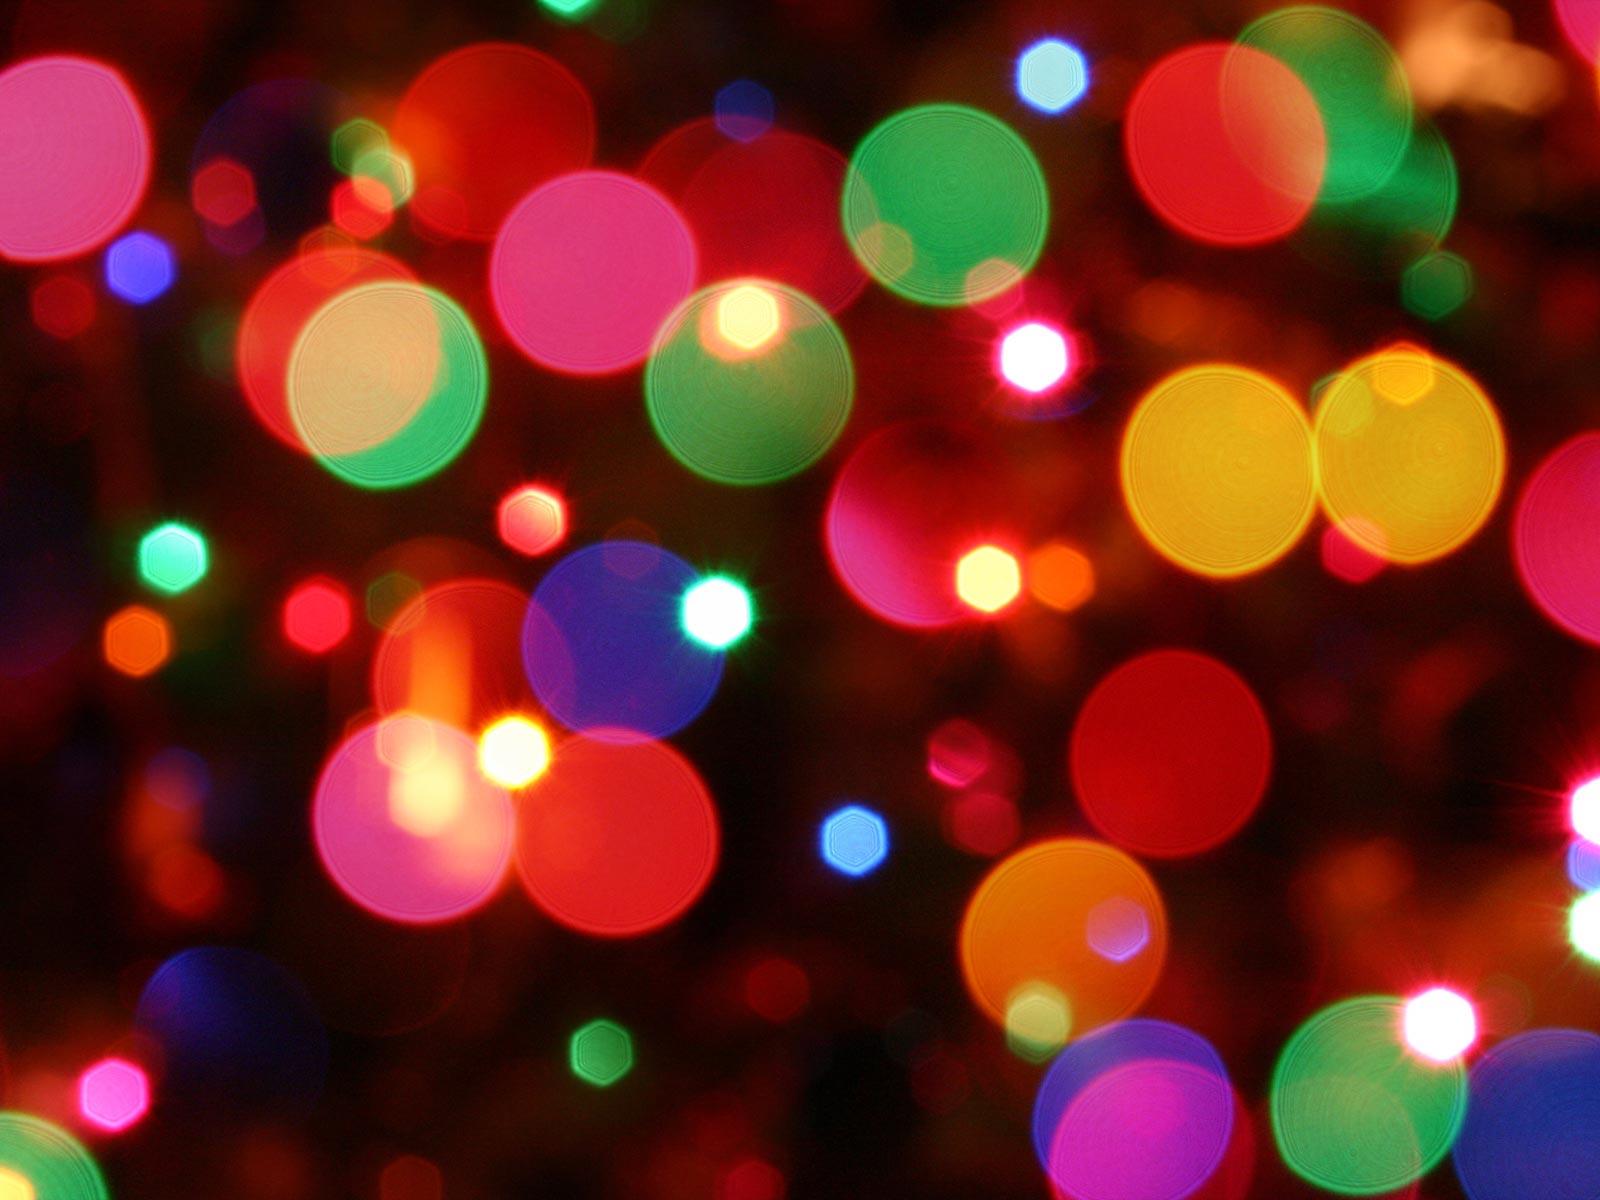 http://4.bp.blogspot.com/_Swdagql_Y-k/TPsCJfN5DrI/AAAAAAAAAFQ/jzE-bZQZYw8/s1600/3-christmas_wallpaper_-_lights.jpg